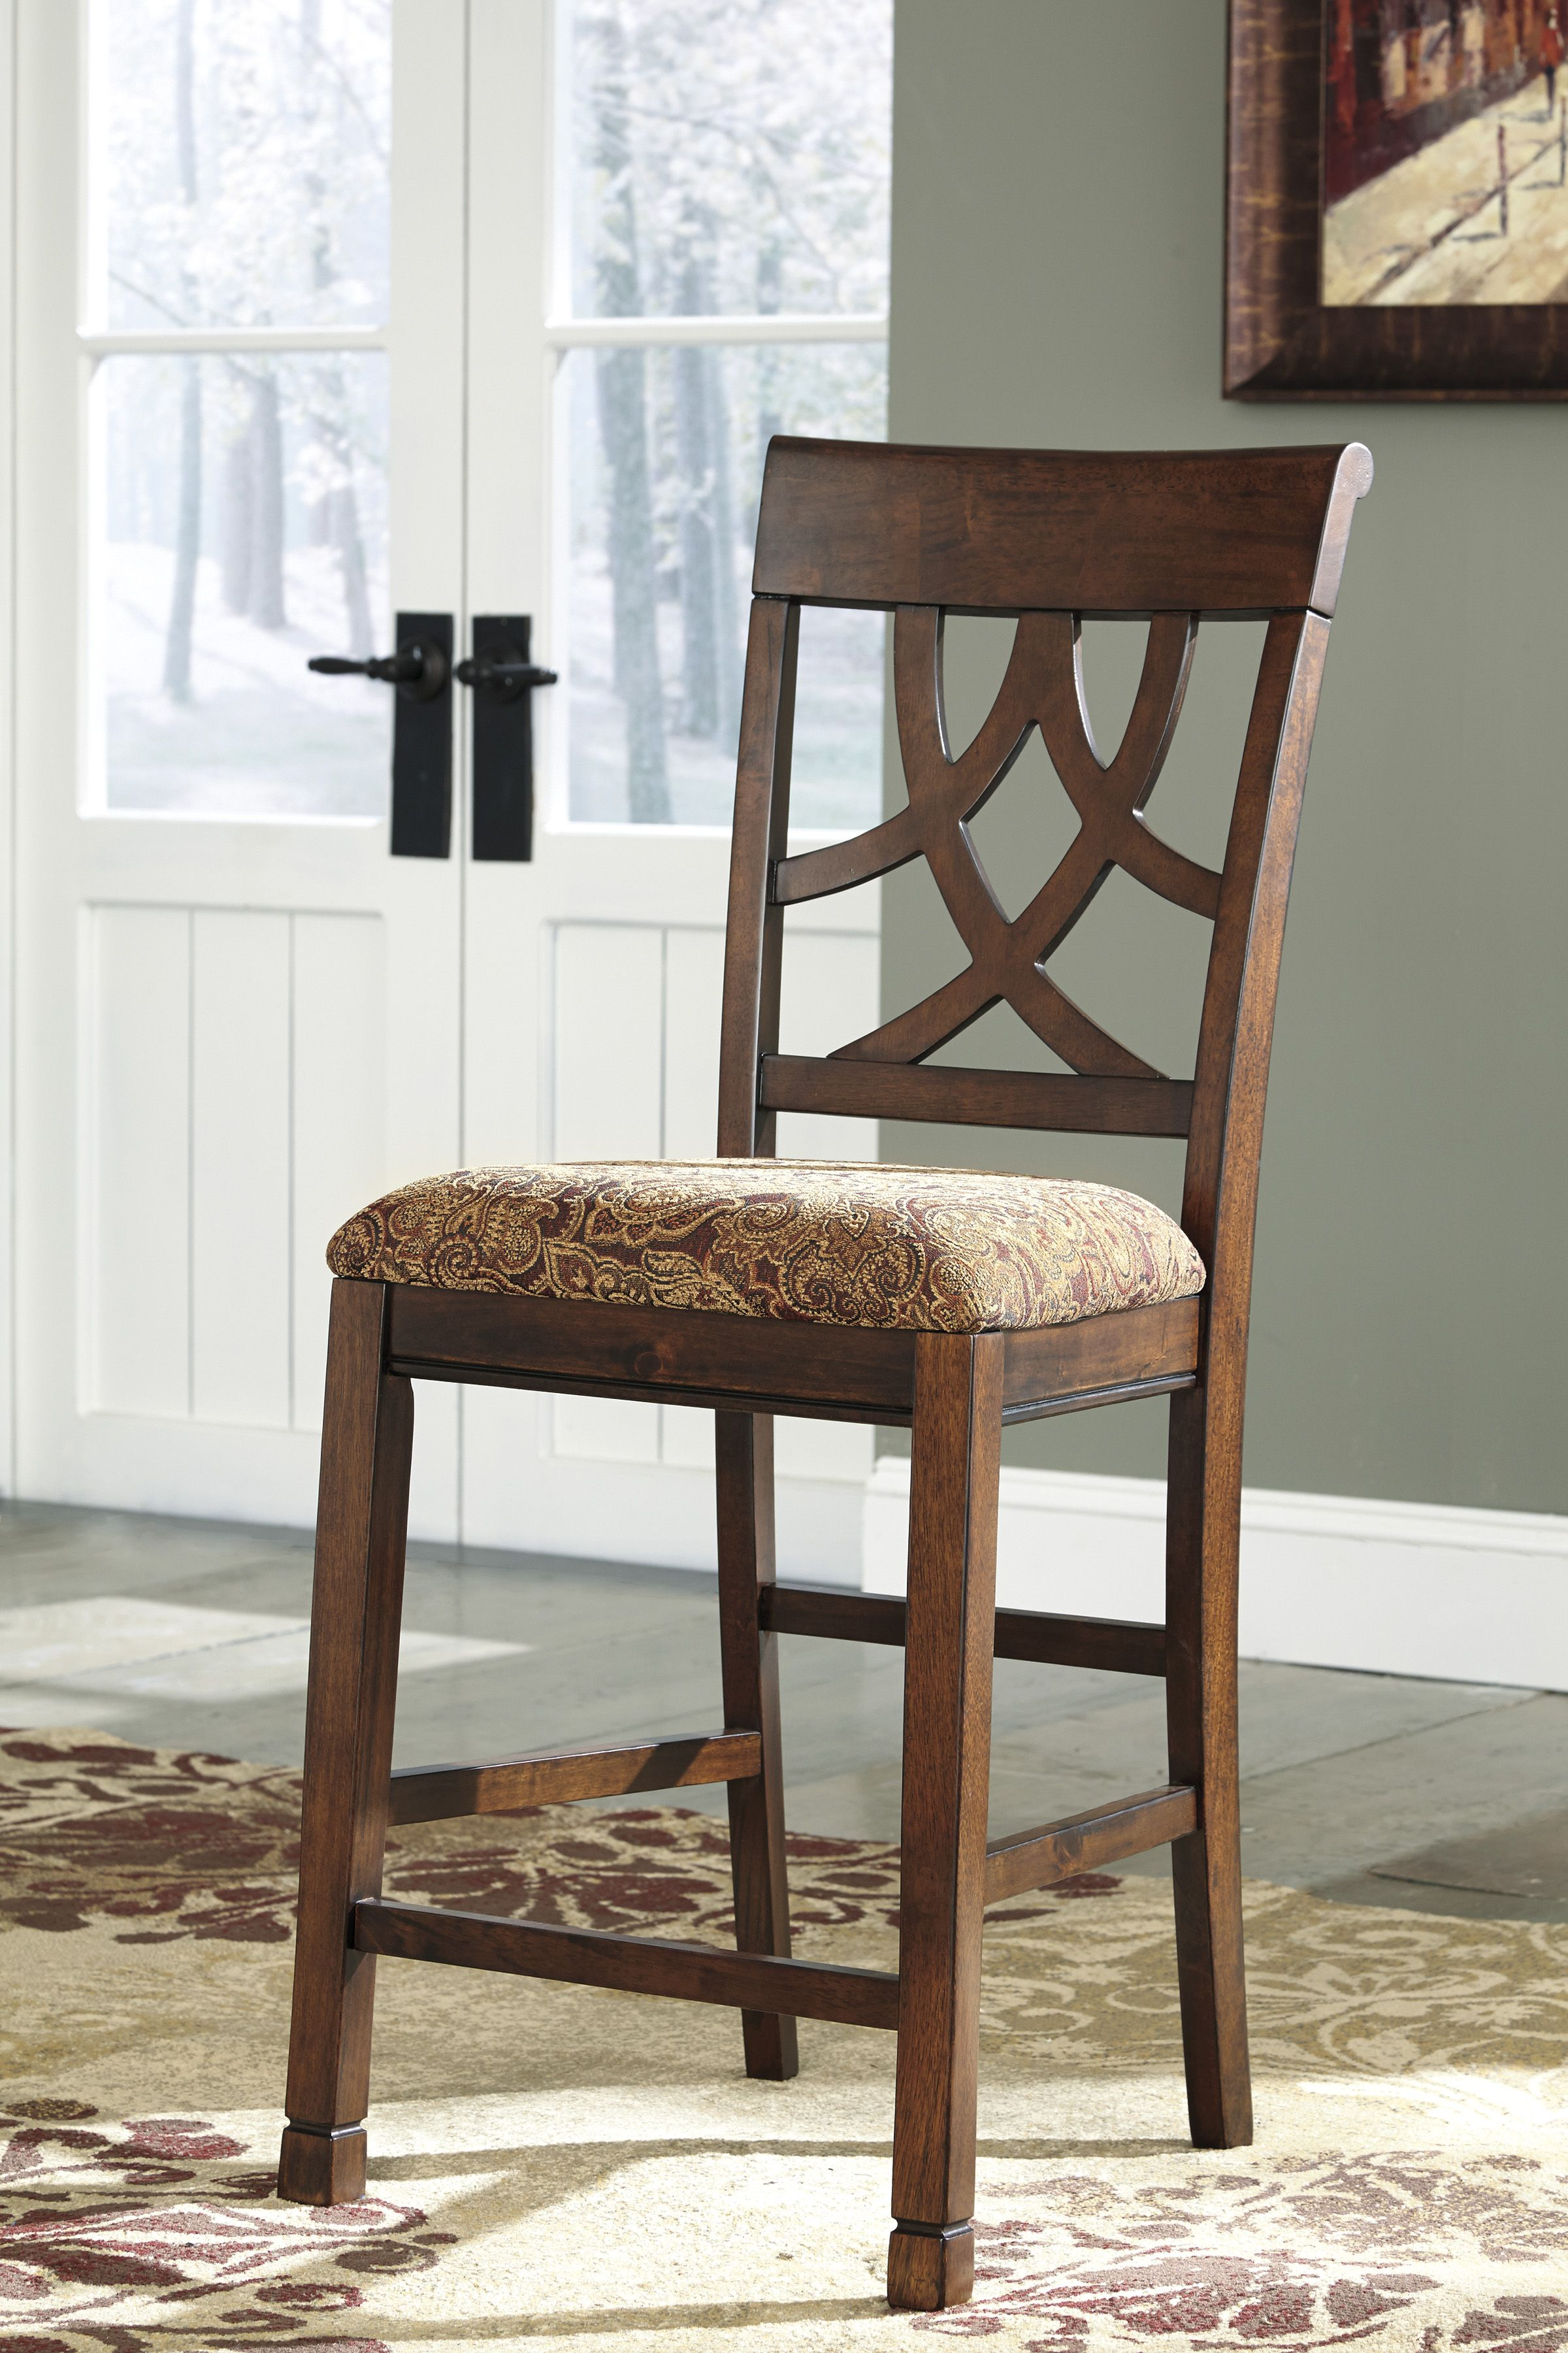 Love This Simple Yet Elegant Barstool That Is Super Kid Friendly.    Ashley  Furniture